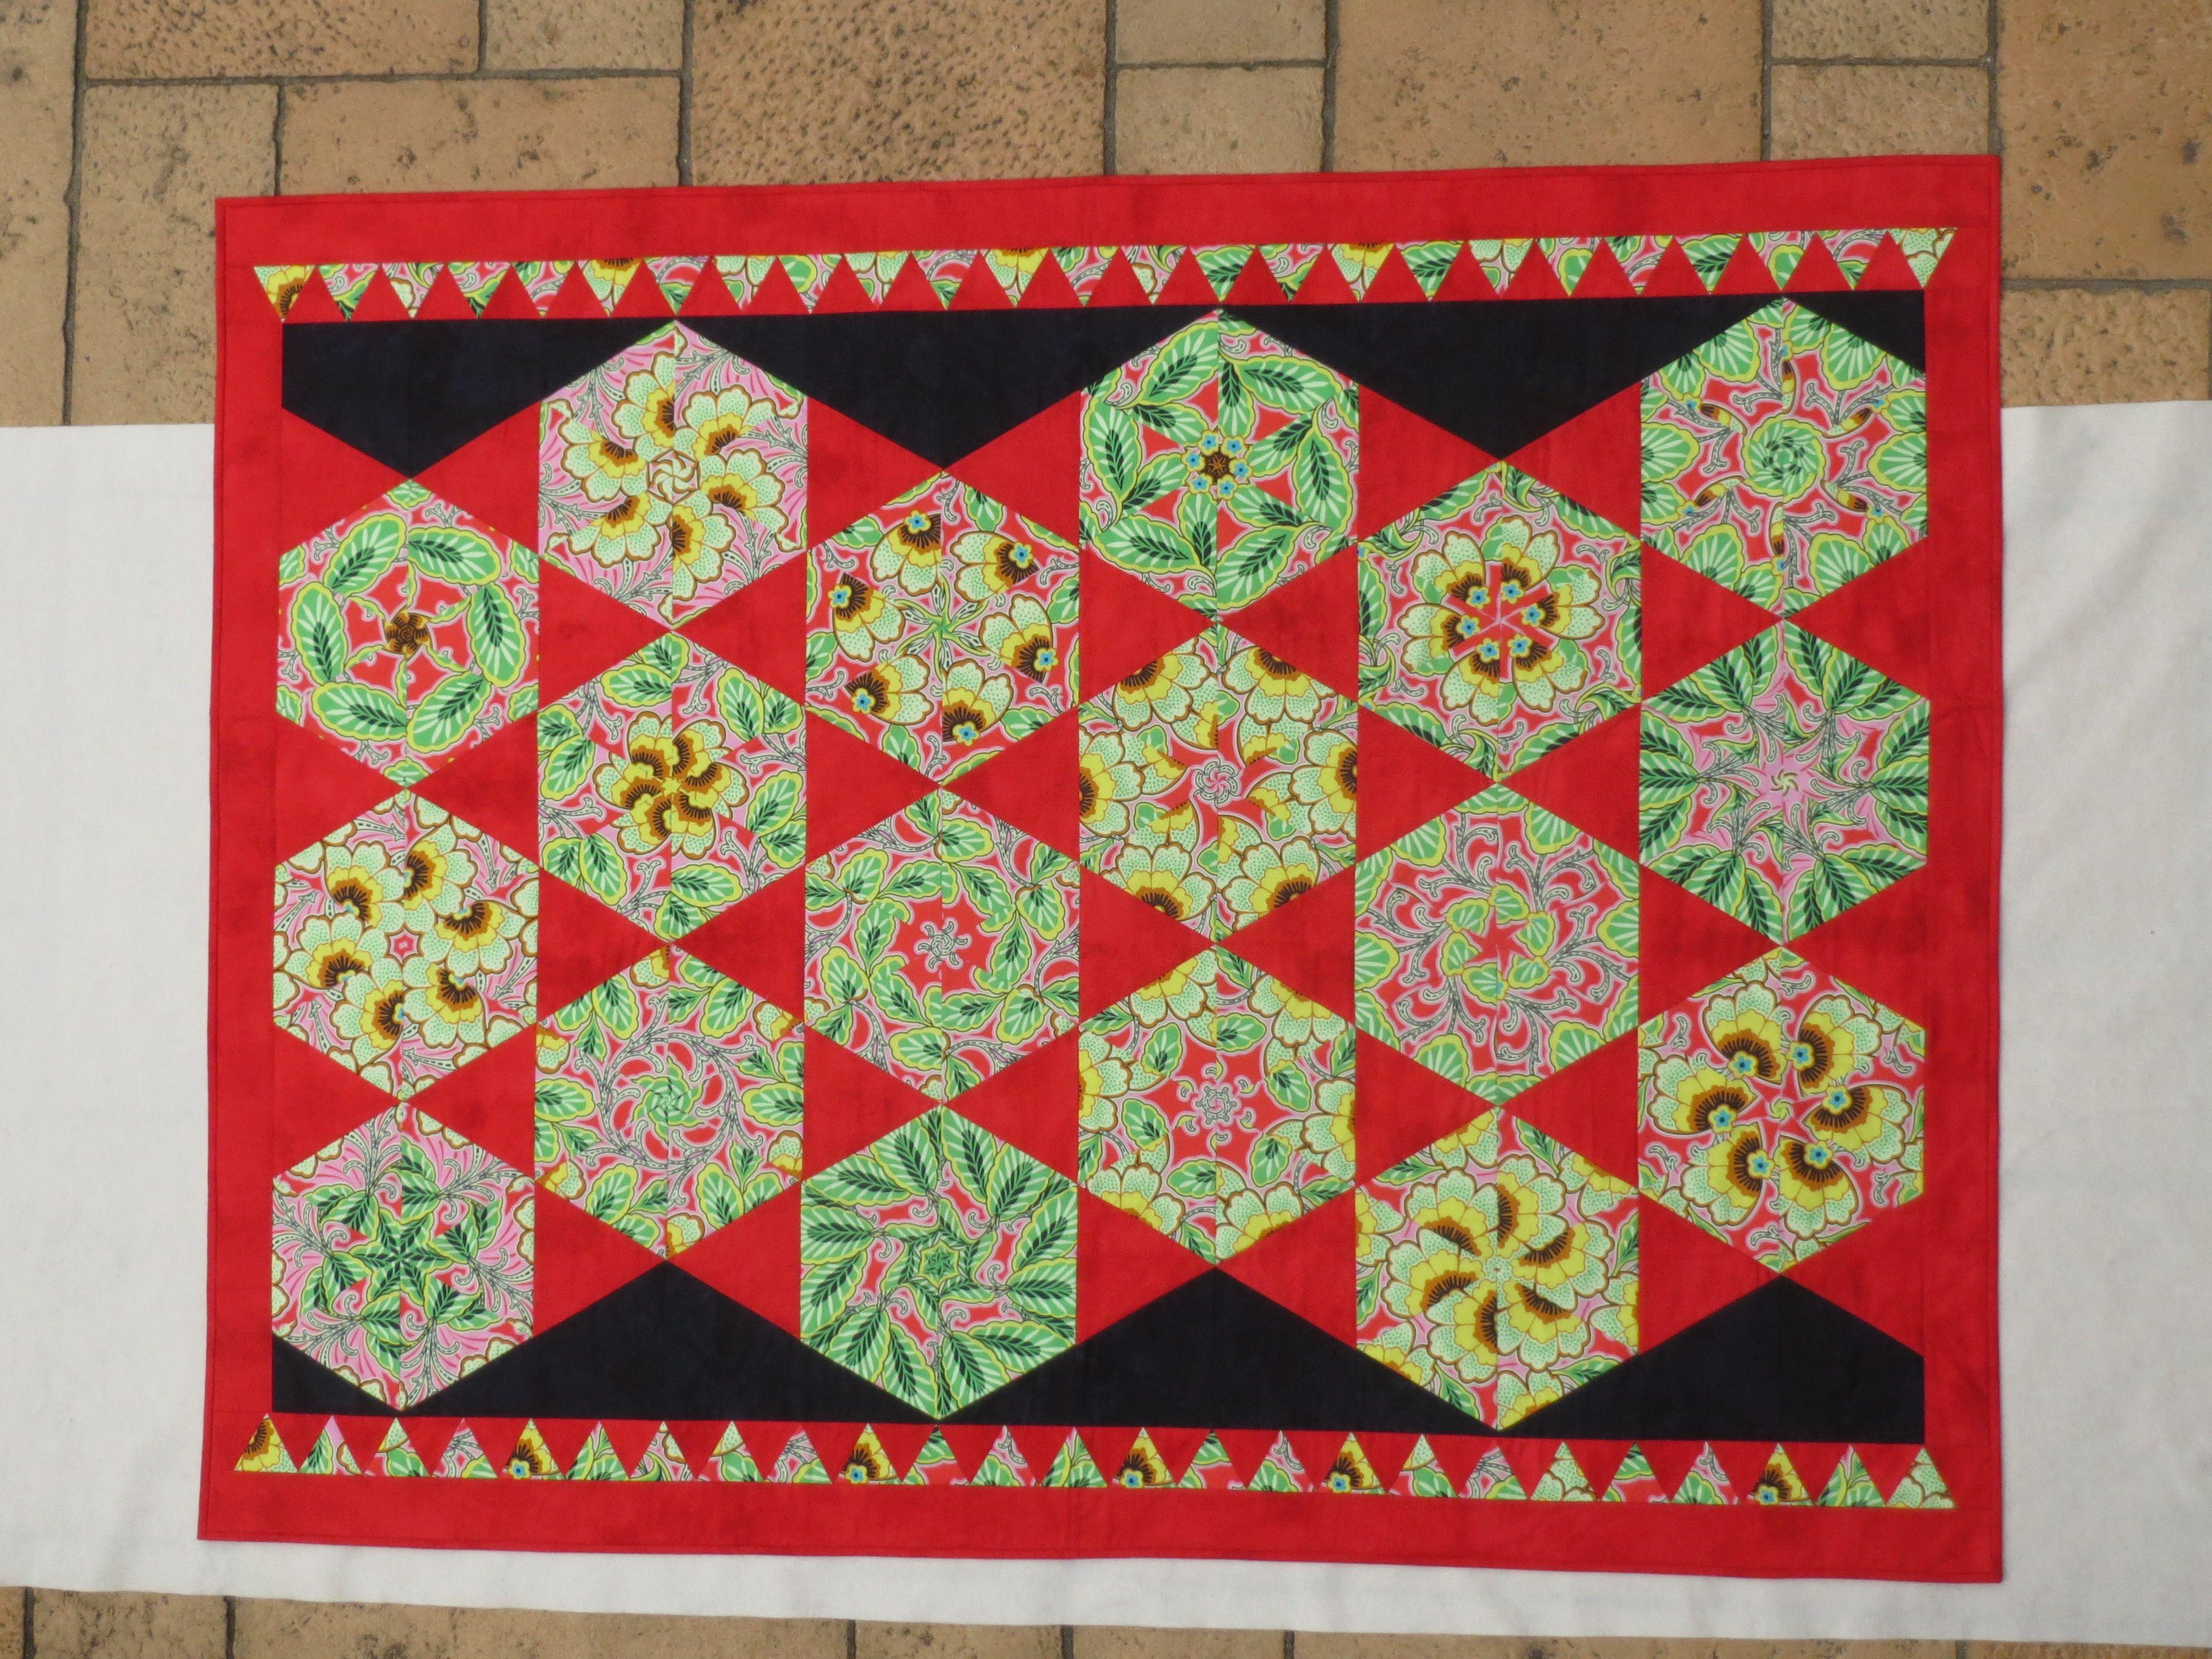 Quiltdecke Kaleidoskop, ca 150 x 200cm